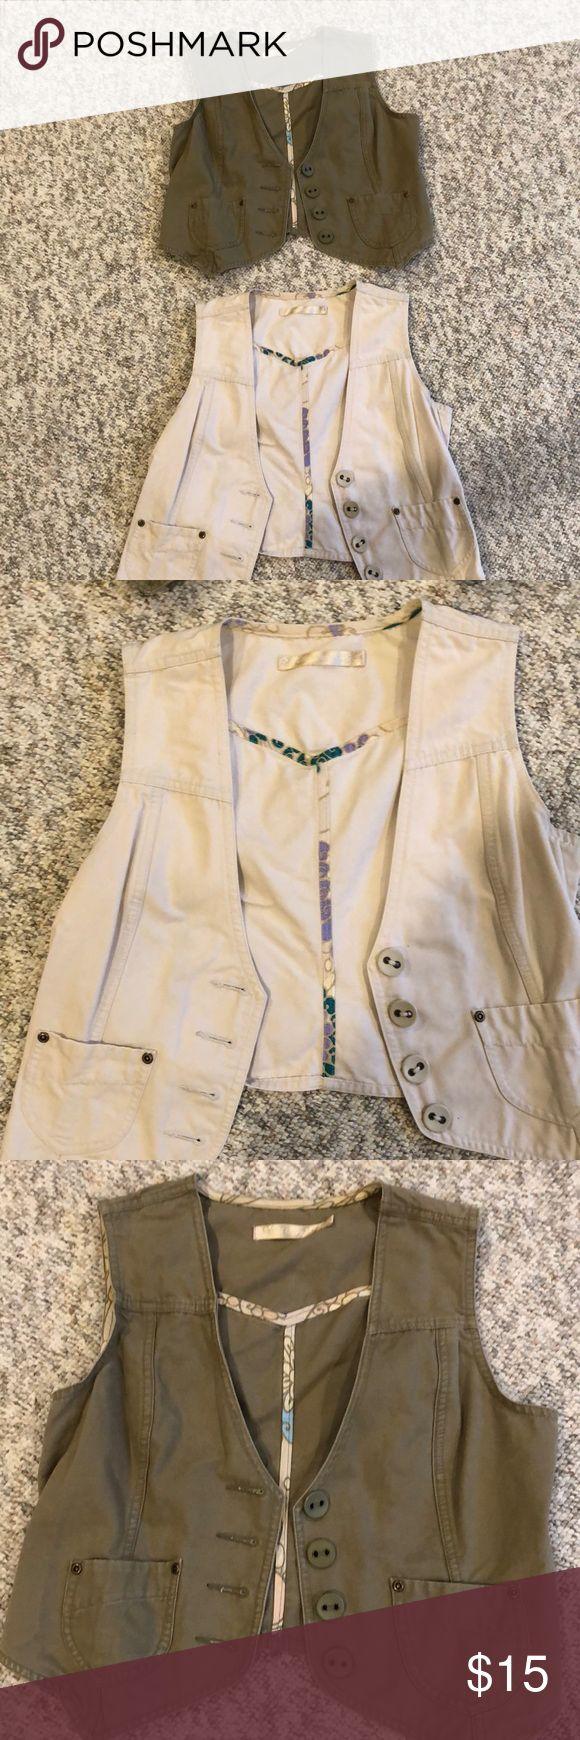 2 old navy vests! Worn a few times! Looks brand new! You get both vests! Jackets & Coats Vests